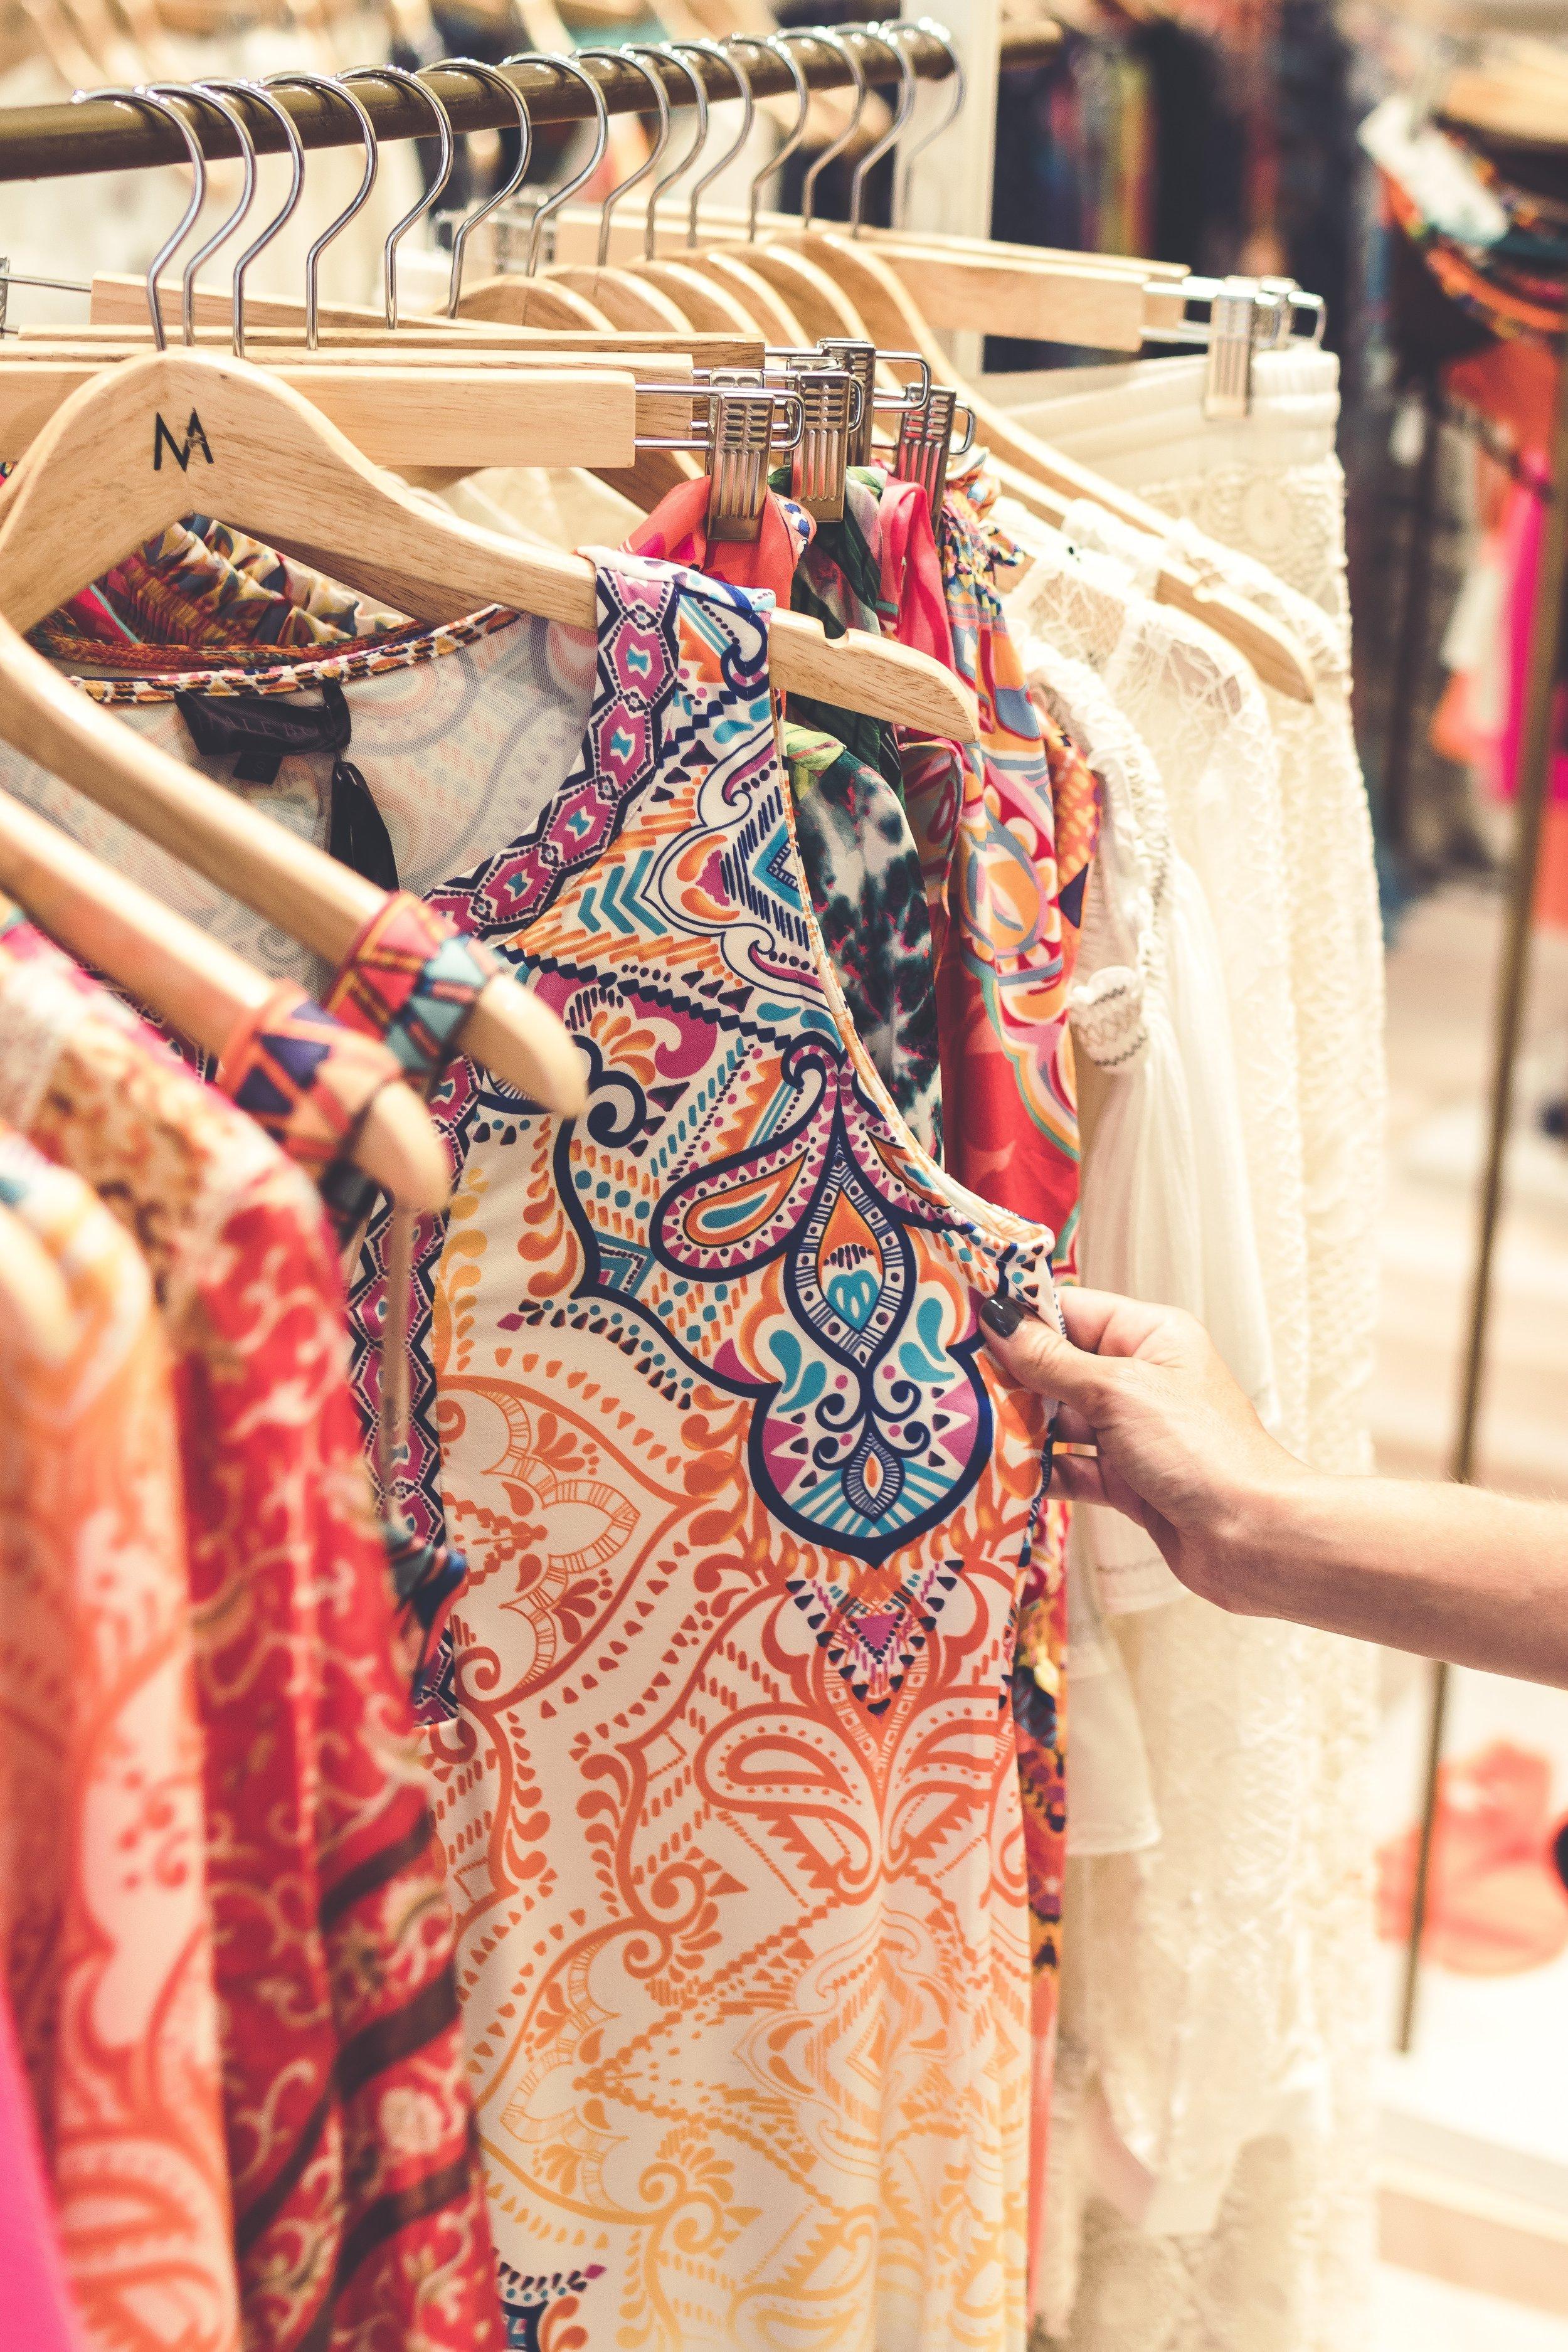 MERCH OR SERVICE VENDOR - Have custom clothing designs, creative art, or service?